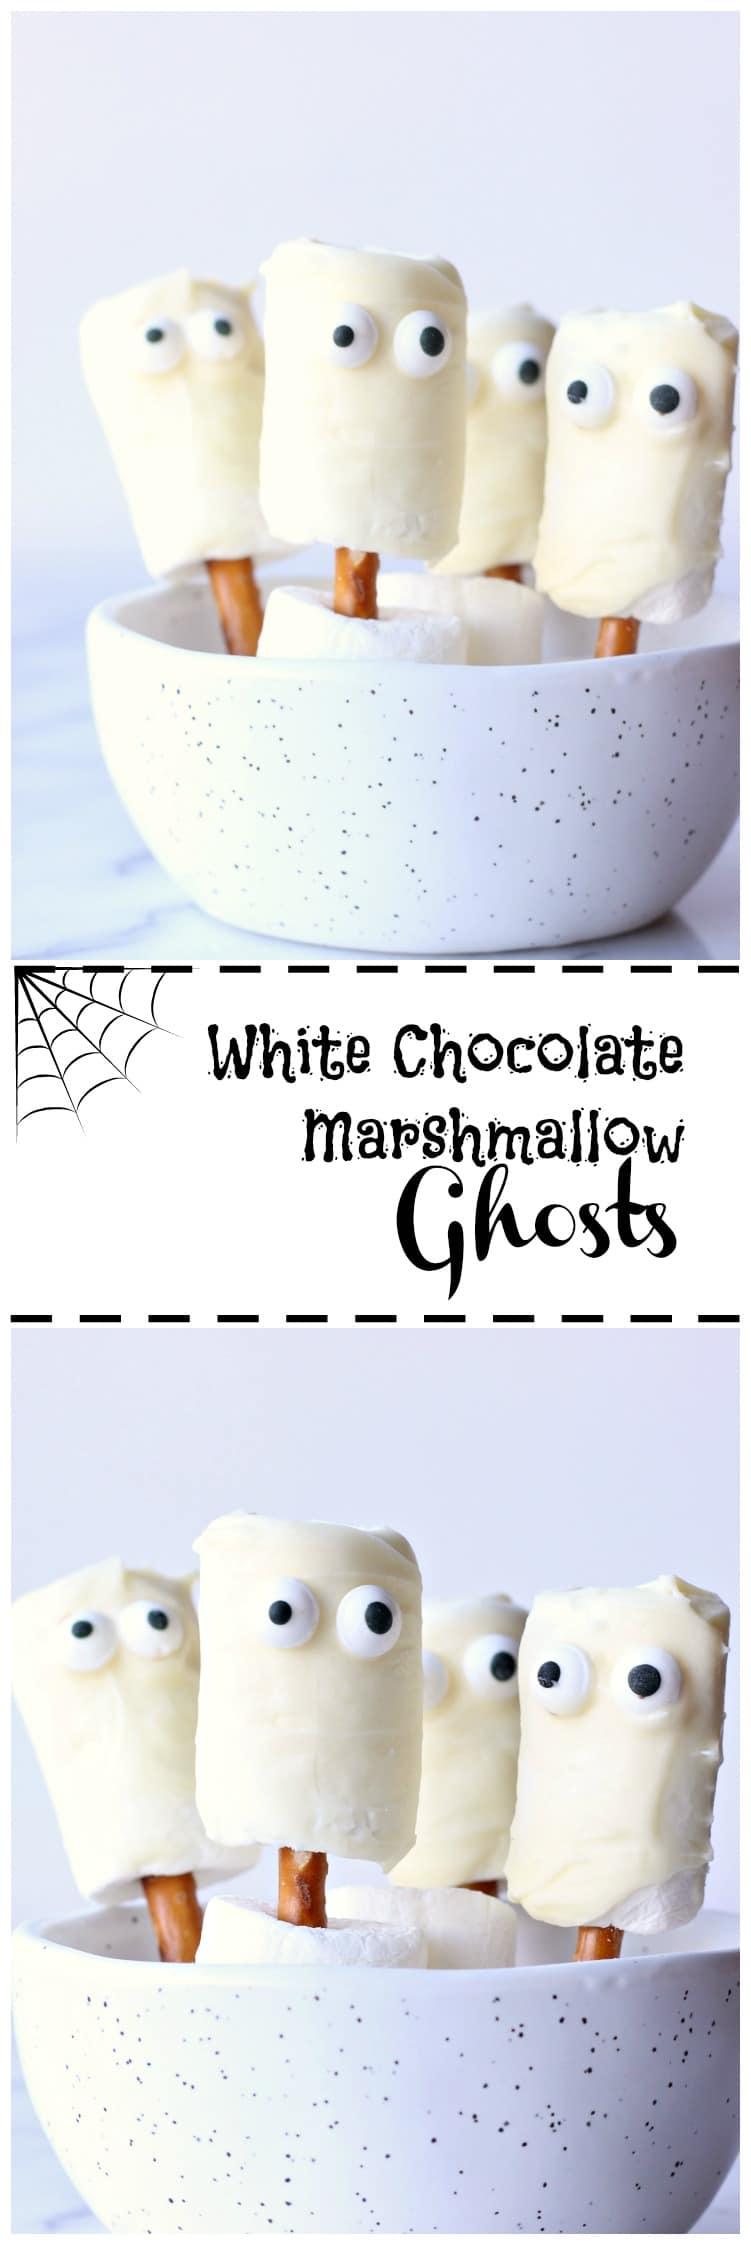 White Chocolate Marshmallow Ghosts | gardeninthekitchen.com